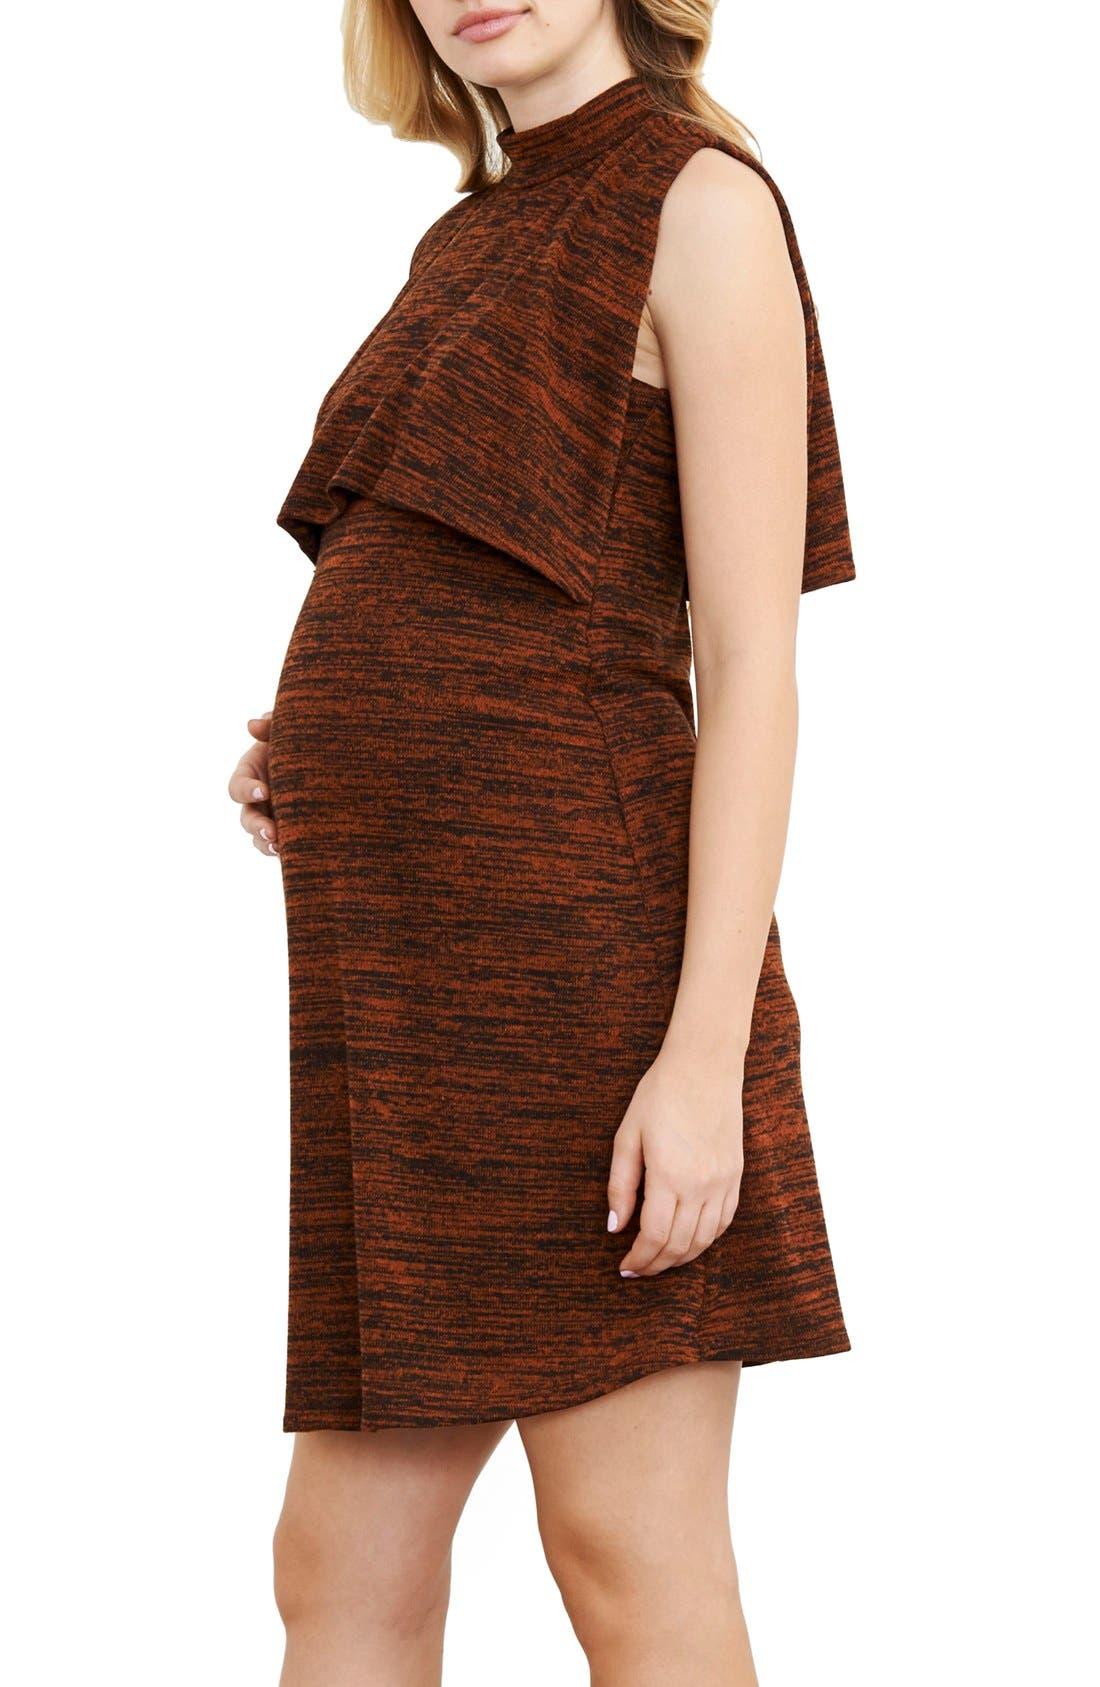 MATERNAL AMERICA Maternity/Nursing Knit Dress